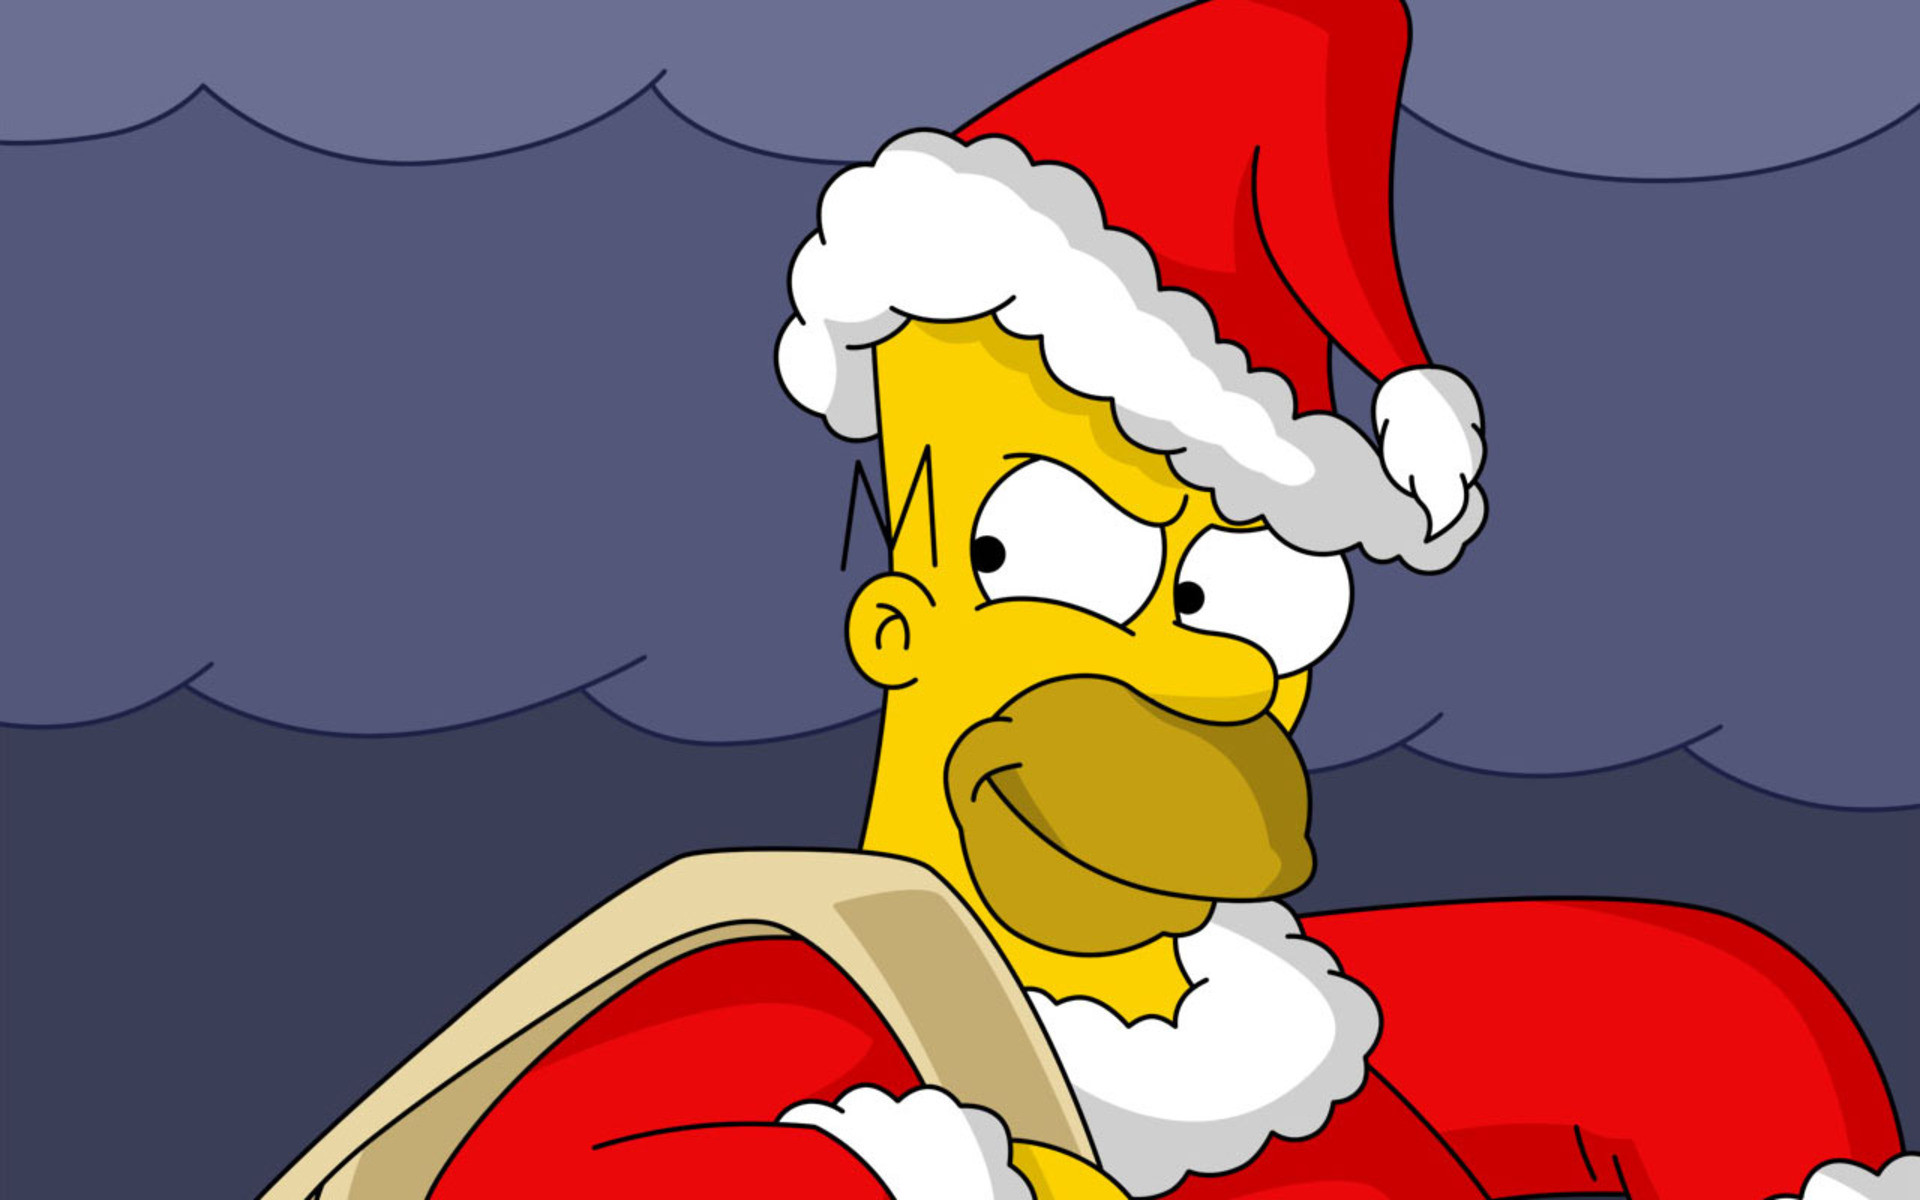 Xmas Stuff For > Funny Christmas Cartoon Characters